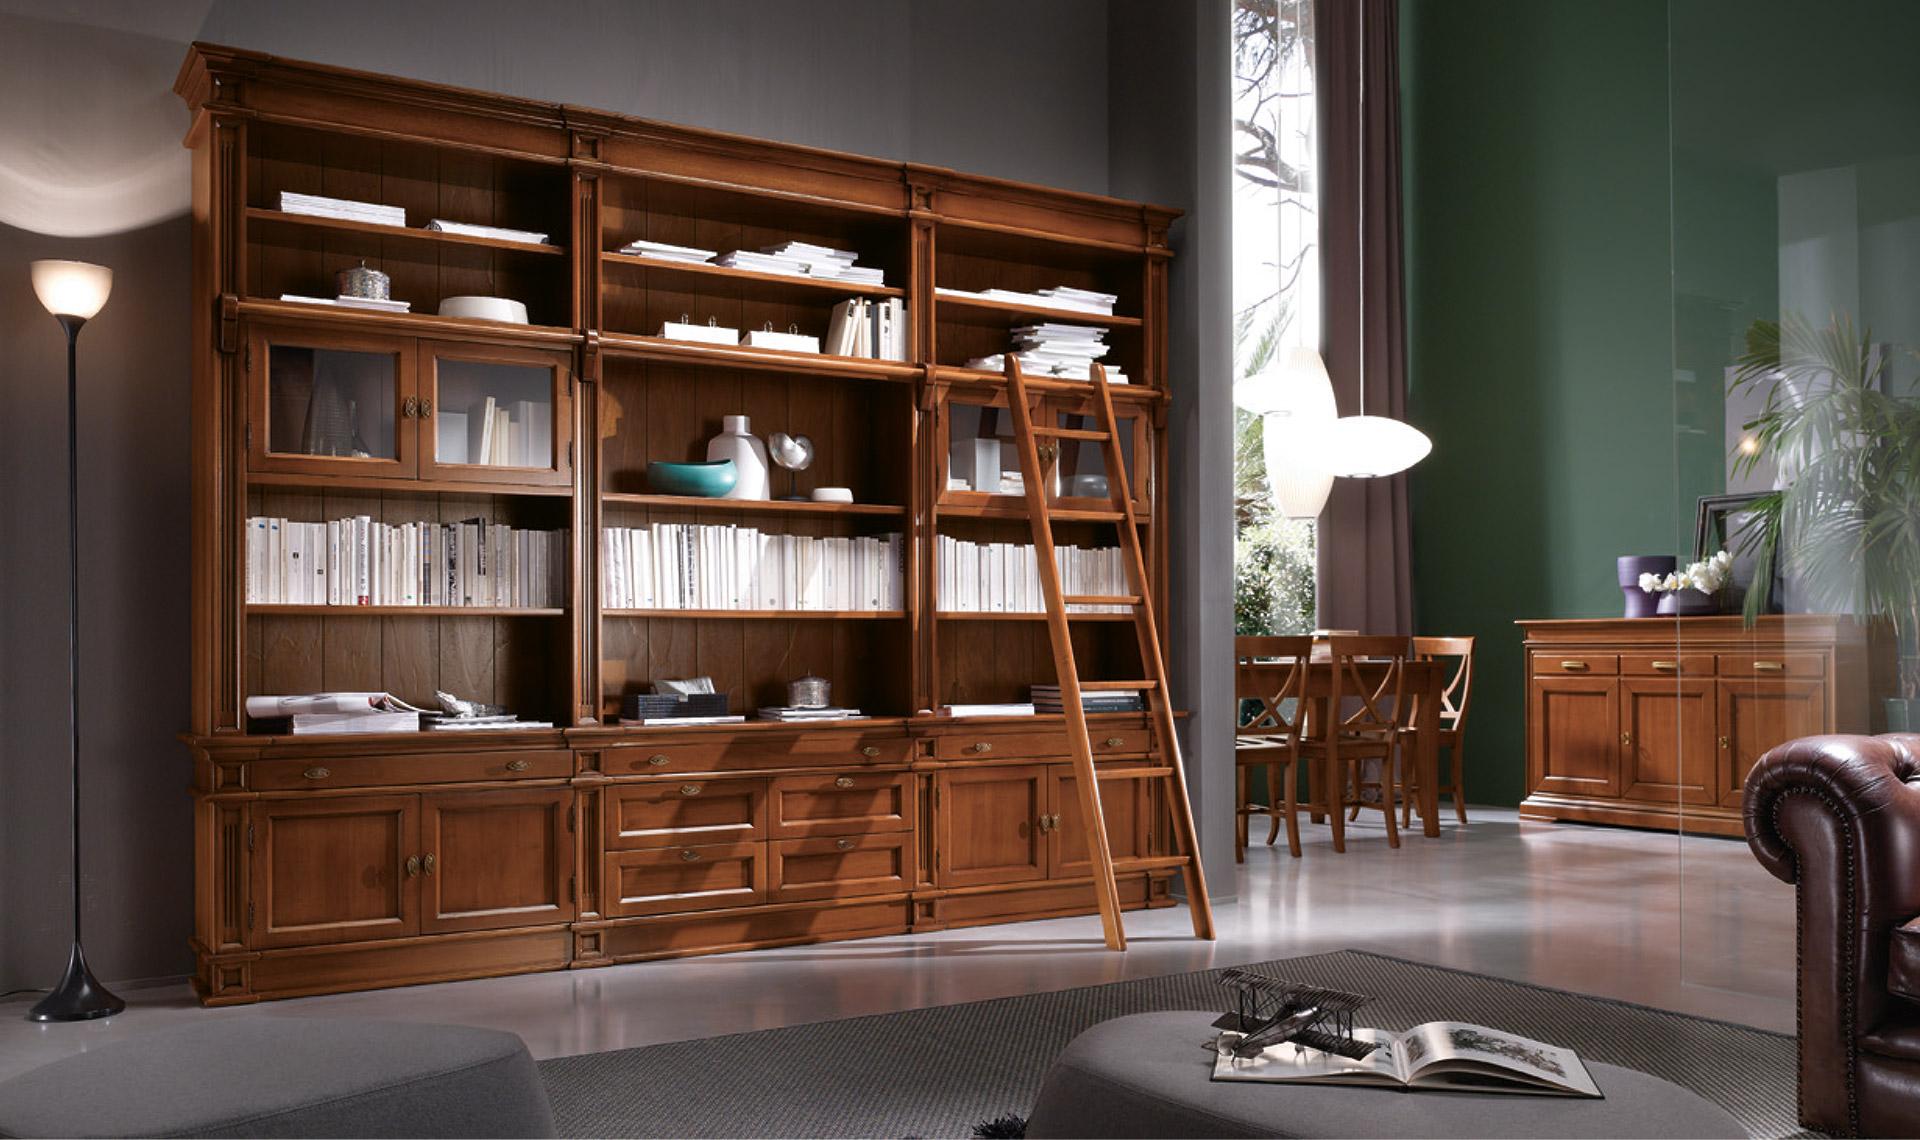 Cl ssics muebles almazan - Muebles en almazan ...